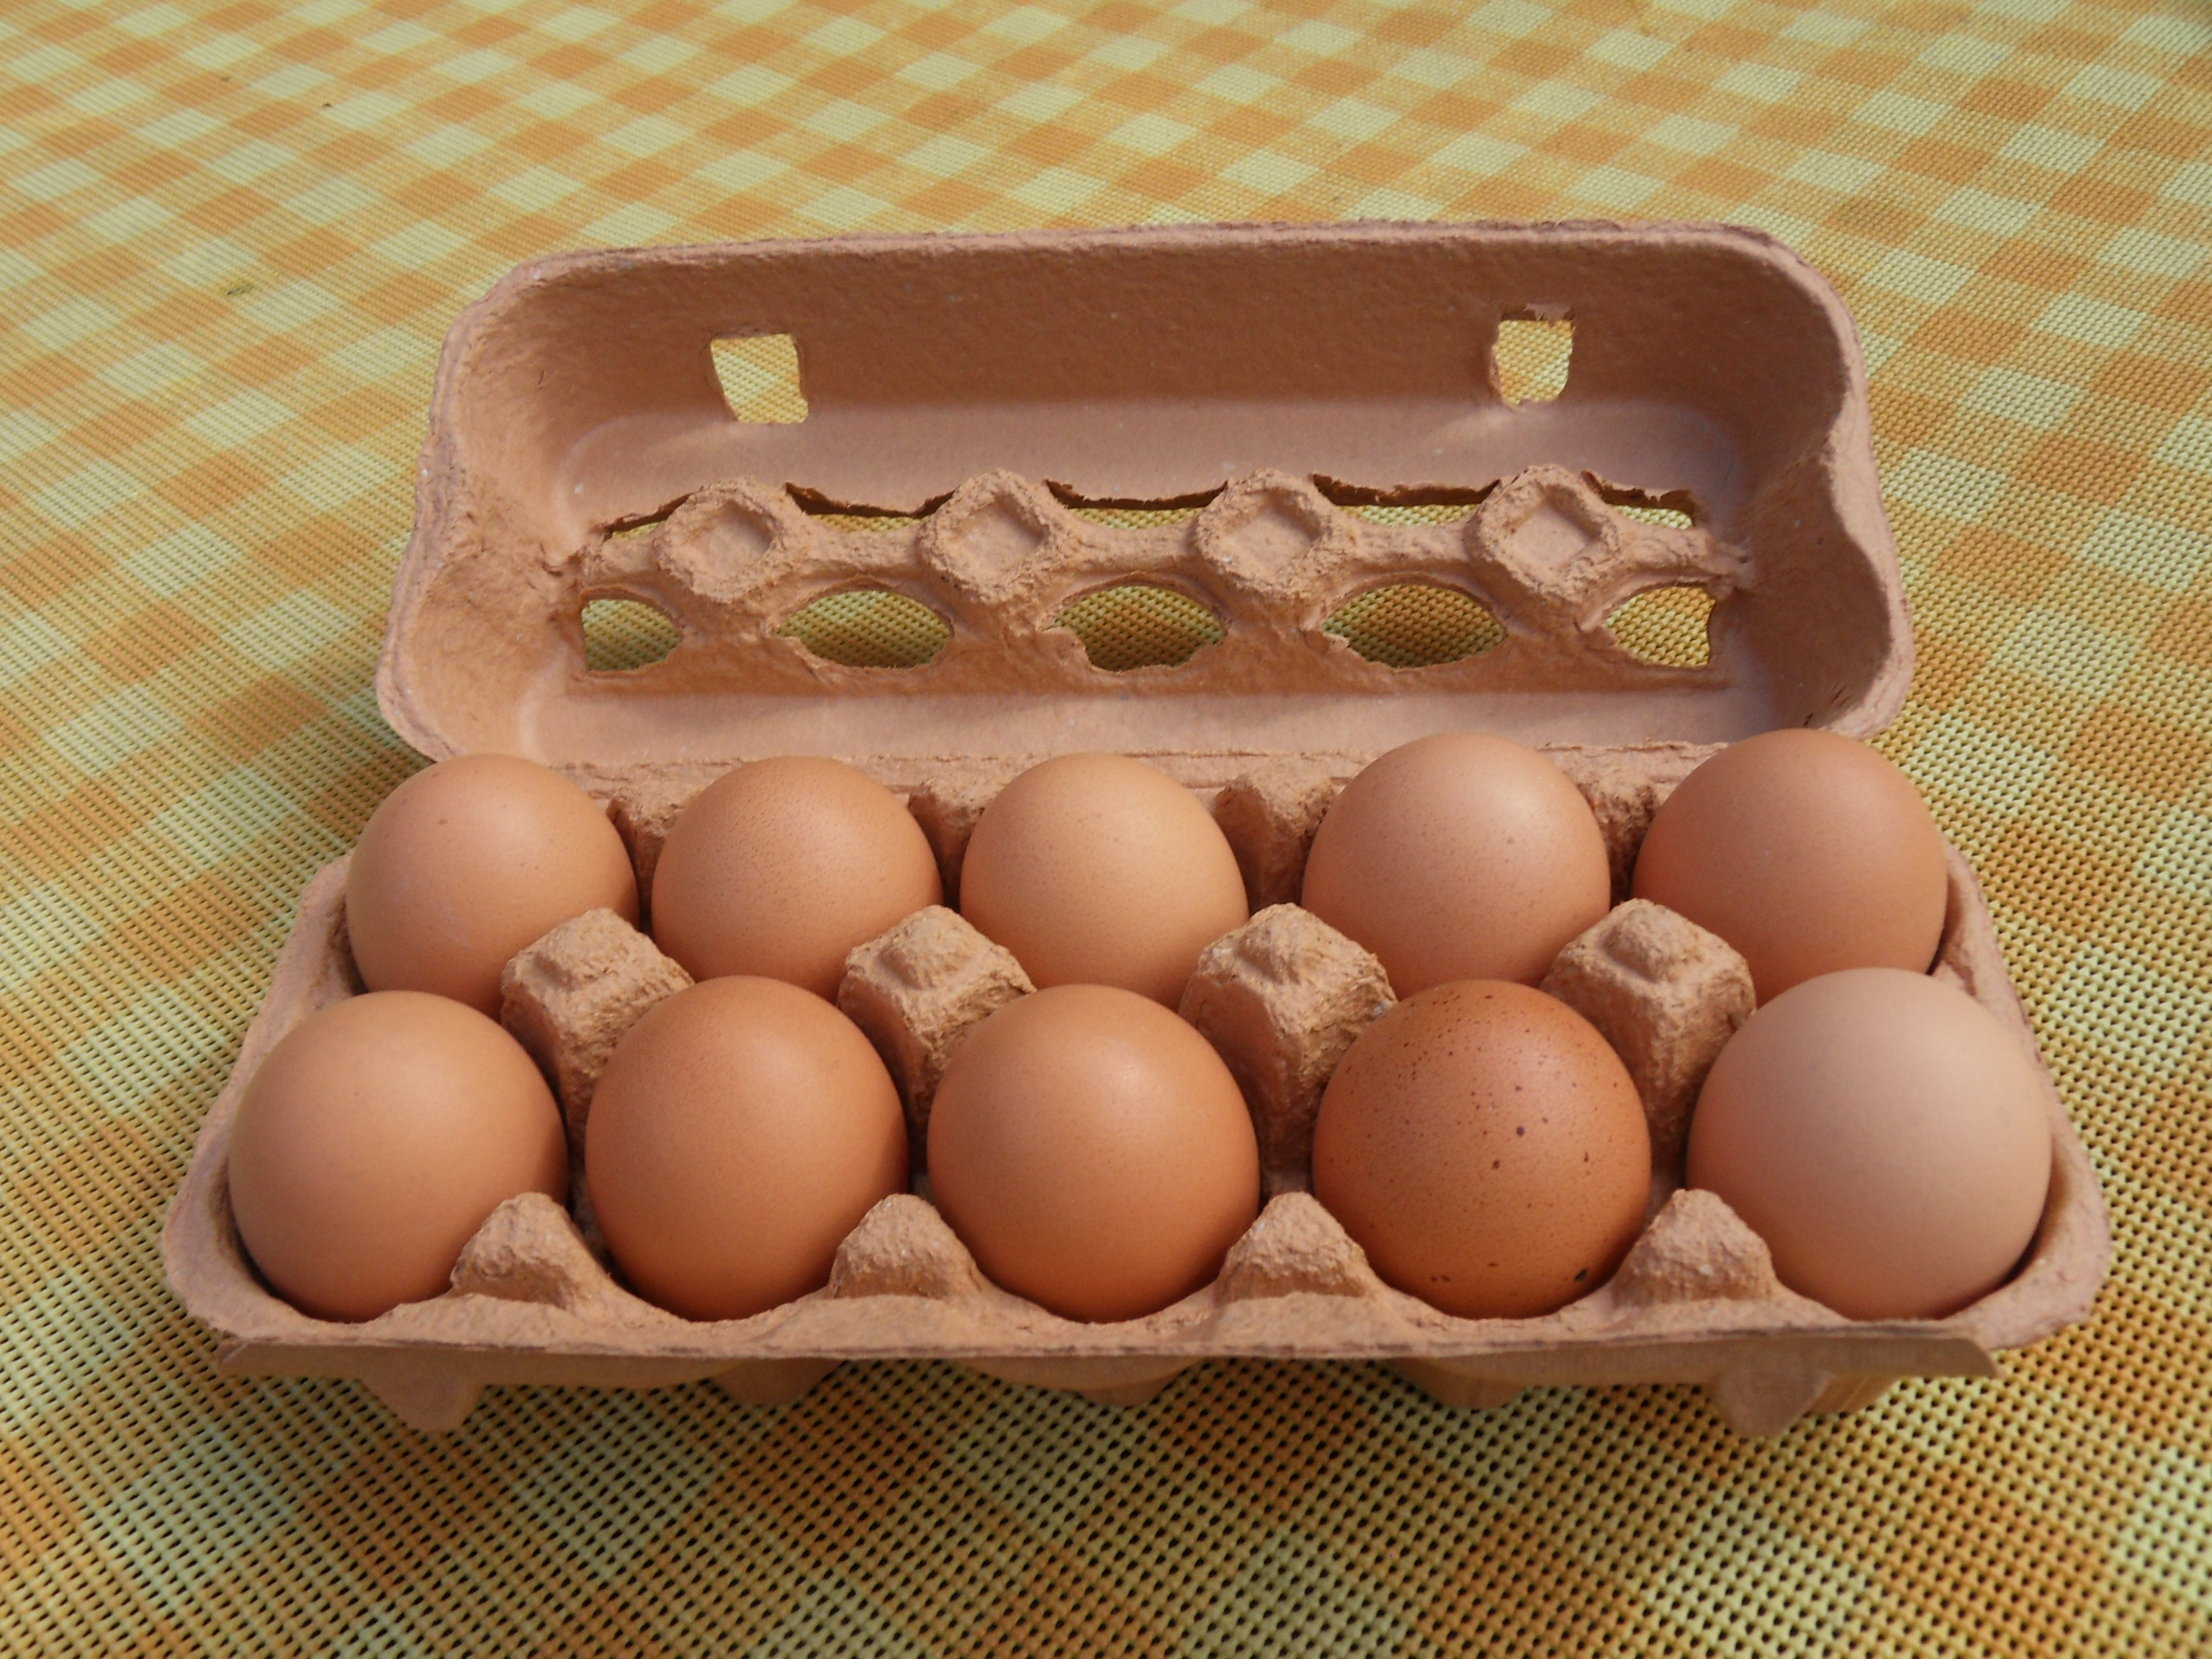 Egg carton - Wikipedia